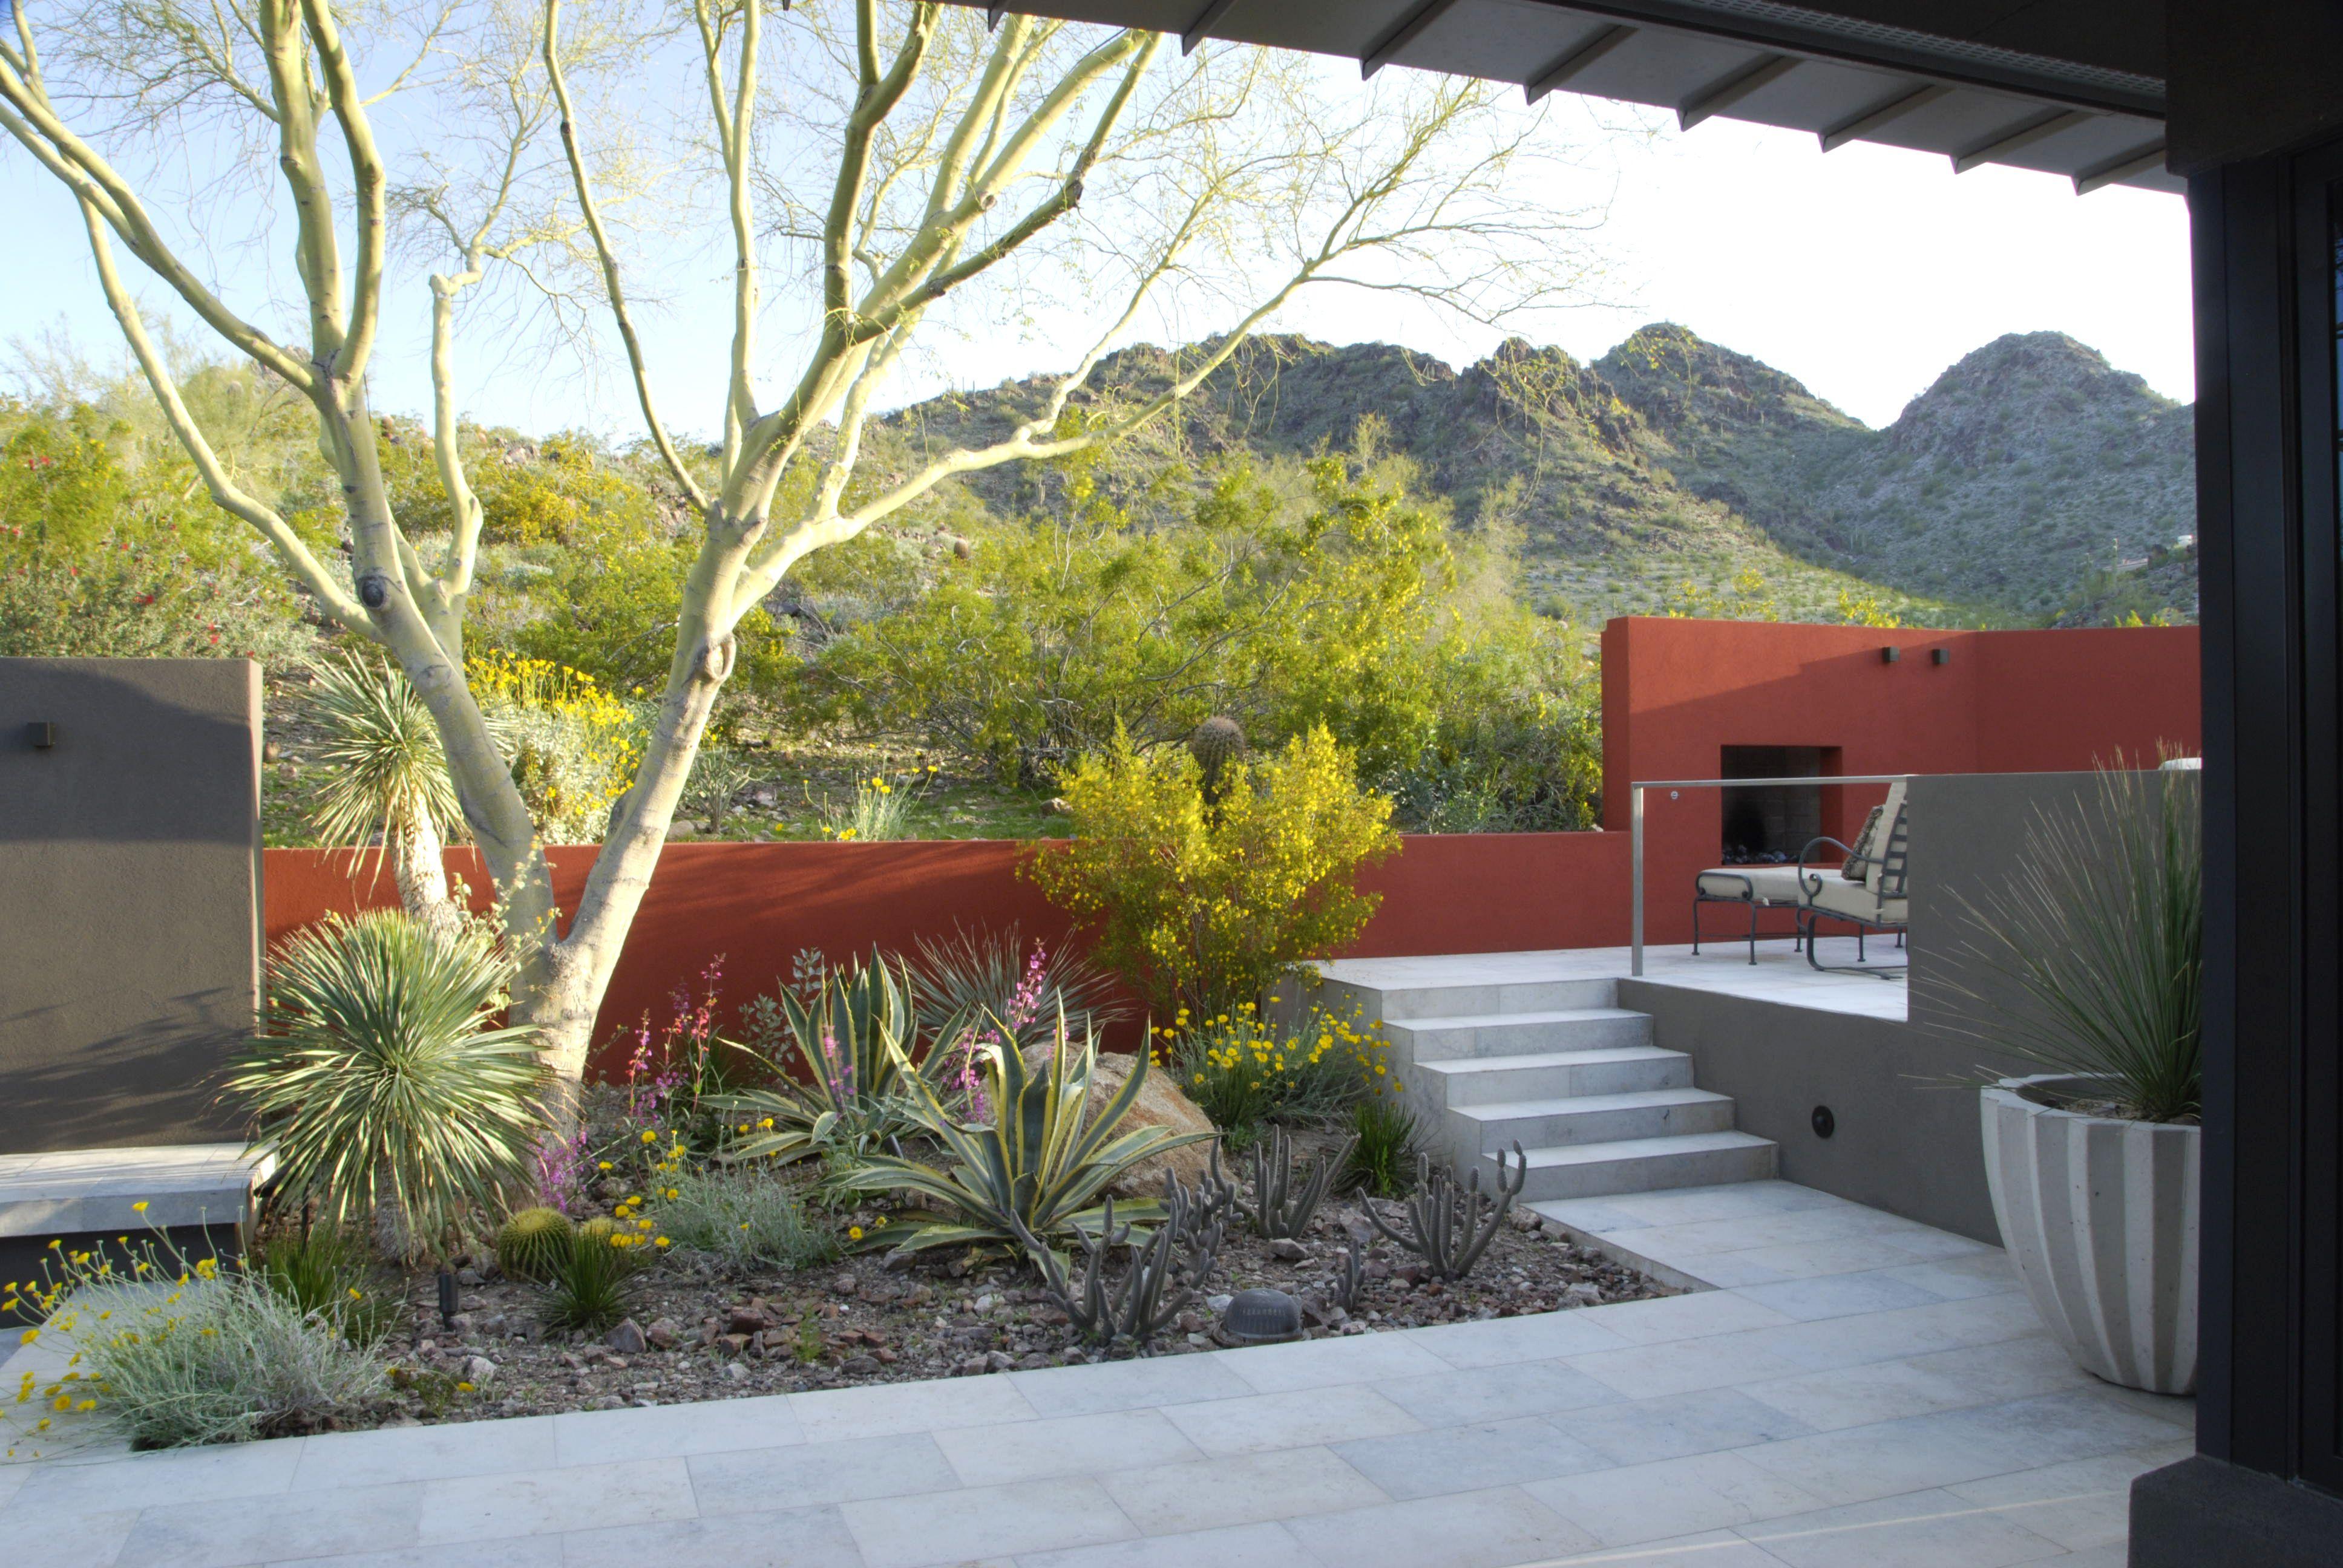 Steve Martino Landscape Architect / Ocotillo Drive Residence, Phoenix